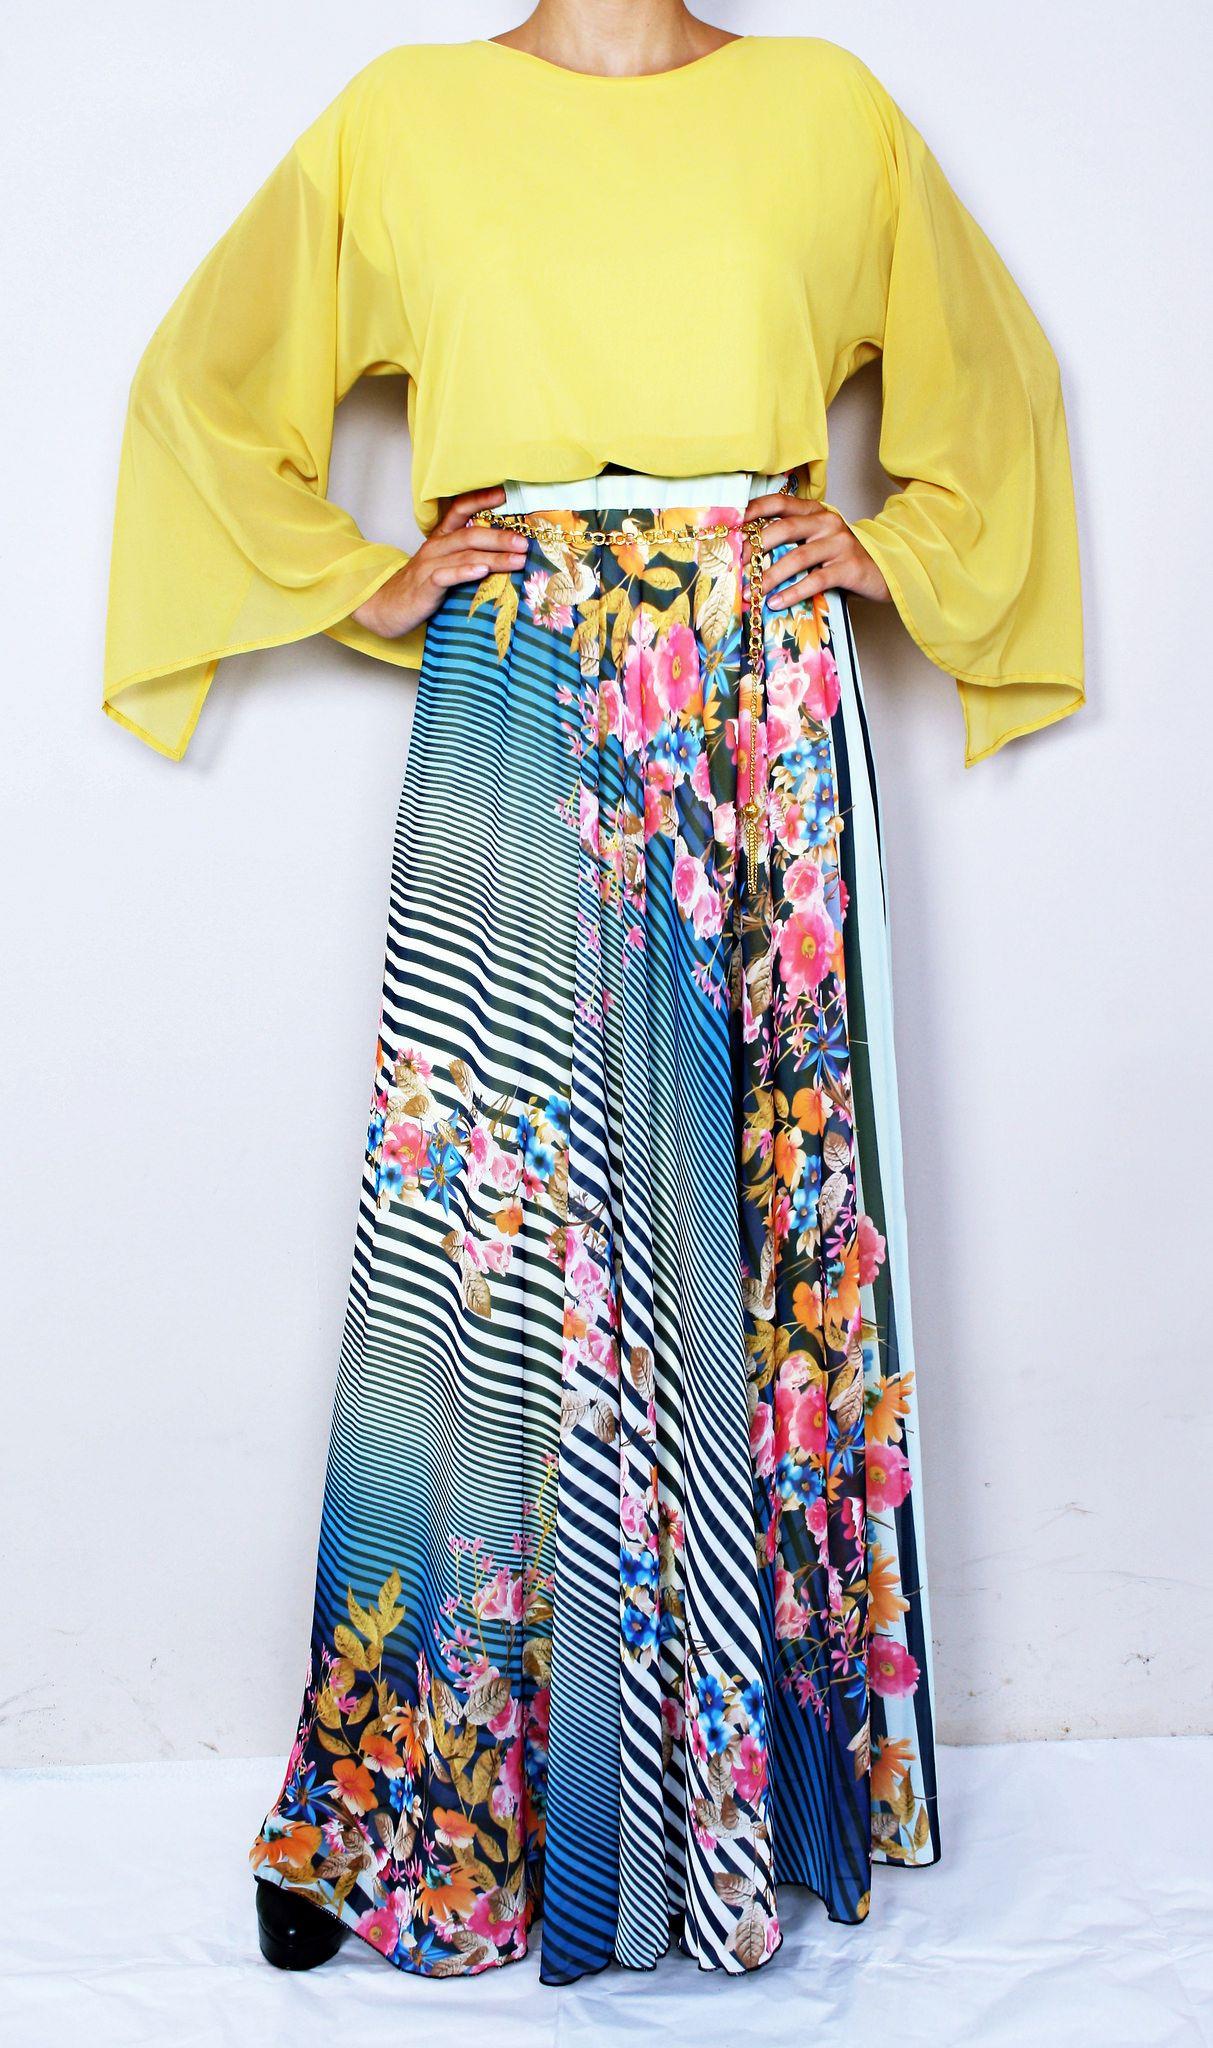 Dress Export - Import / Retail- Wholesale Sizes: 38,40,42,44,46 http://www.mojjil.com/ Facebook: Mojjil Contact us:05534877661 (WhatsApp) mirajtekstil@mojjil.com #elbise #fashion #moda #dress #instadaily#instagood #giyim #tasarim #butik#enerjik#desen#arabicdresses#middleeast#kuwait#qatar#libya##saudiarabia#lebanon#jordan#conservative#butique#export#import#feast#dress#womendress#womencloth#nofilter#beautiful